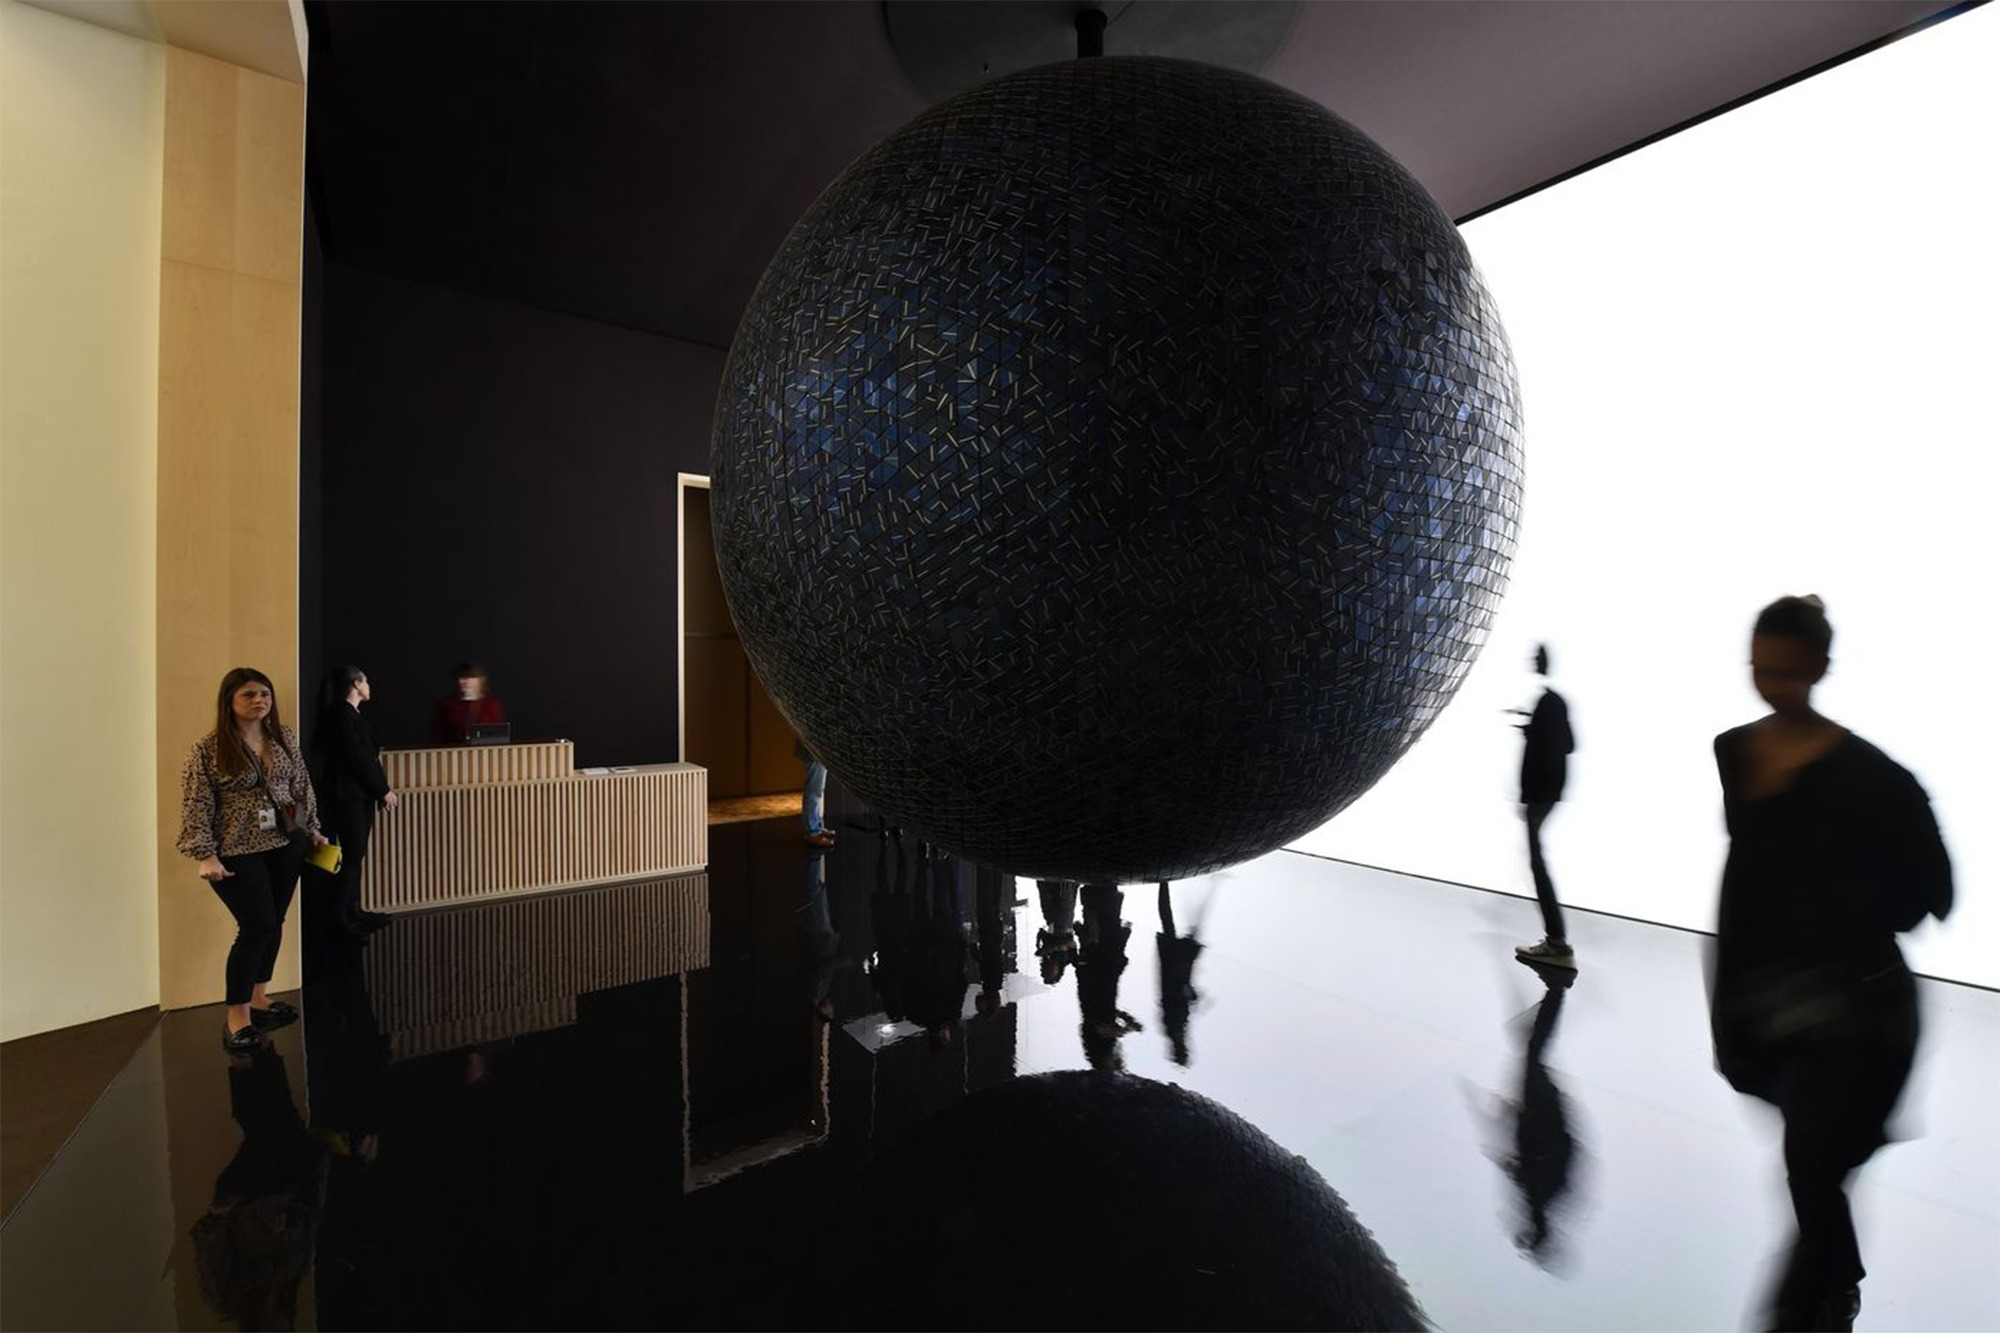 SIHH 2019 - Oeuvre de Hideki Yoshimoto sur le stand Hermès